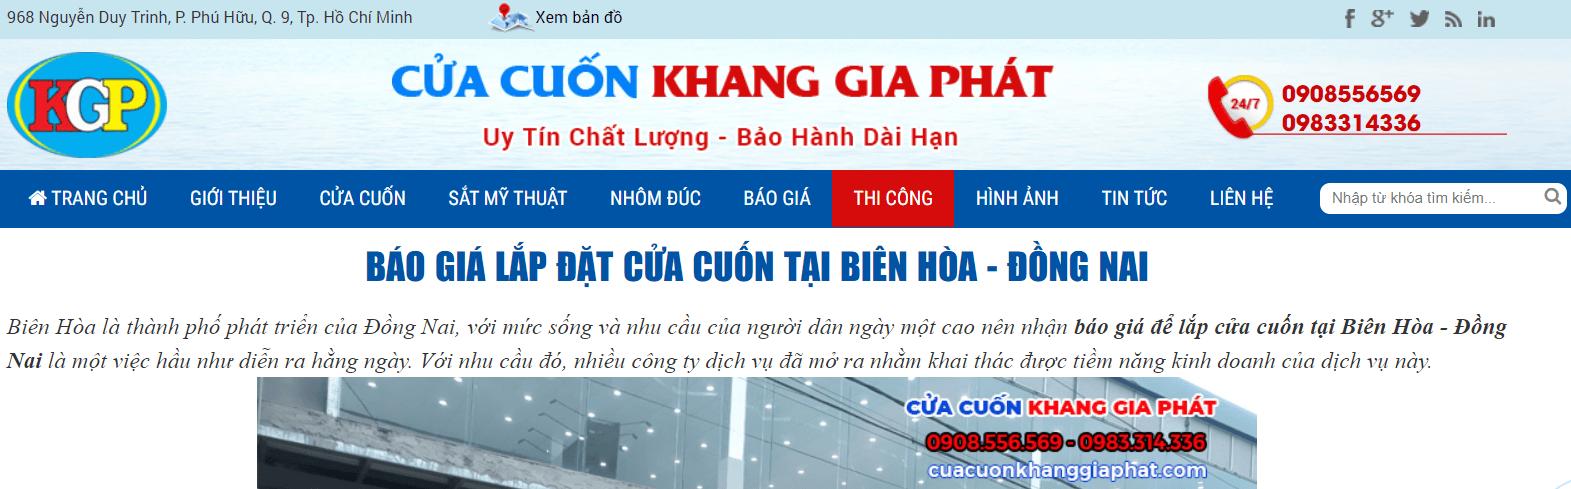 Khang Gia Phát